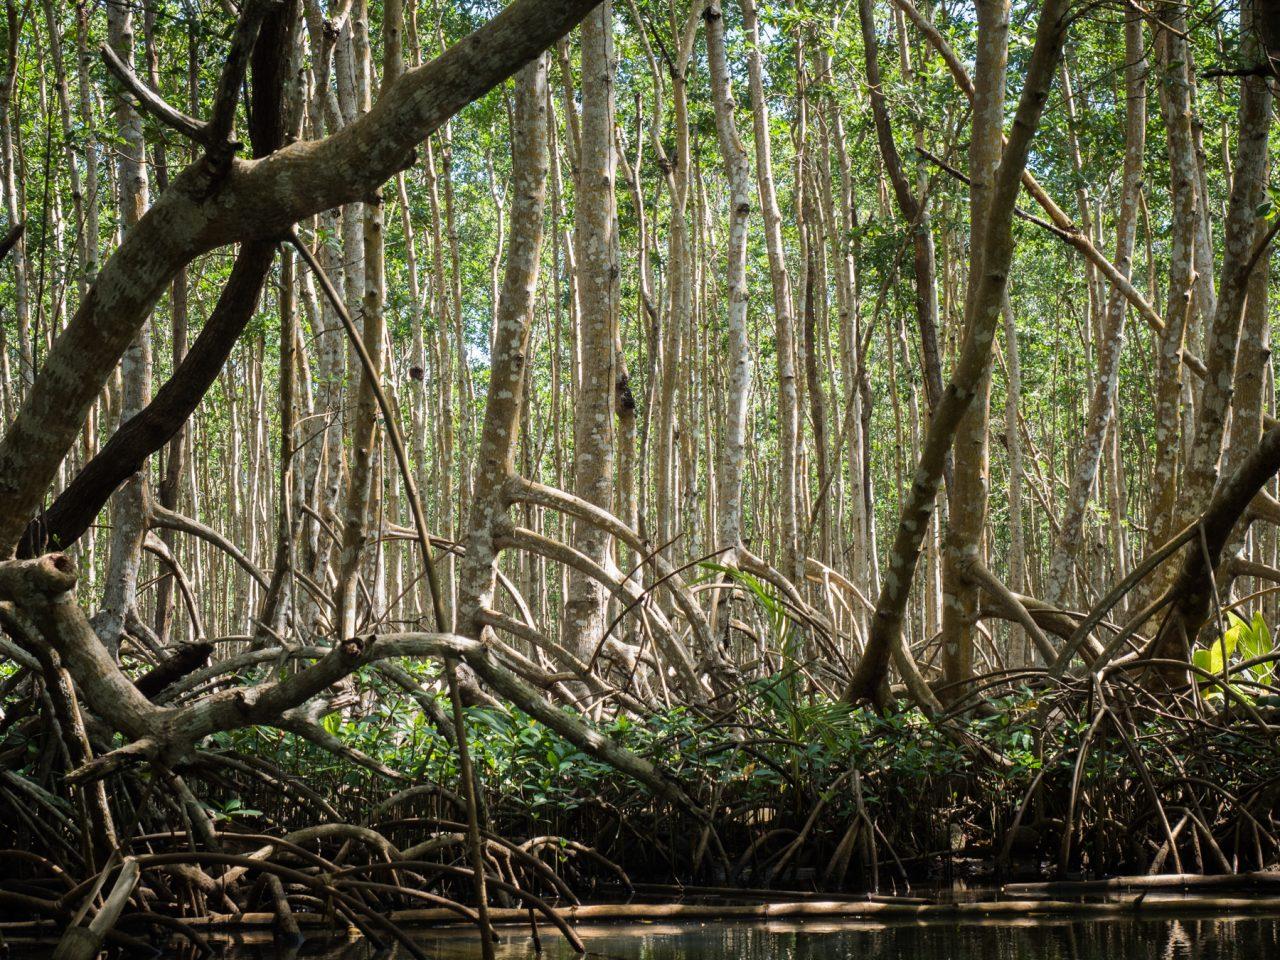 arbre palétuvier-guadeloupe mangrove visite-mangrove kayak guadeloupe